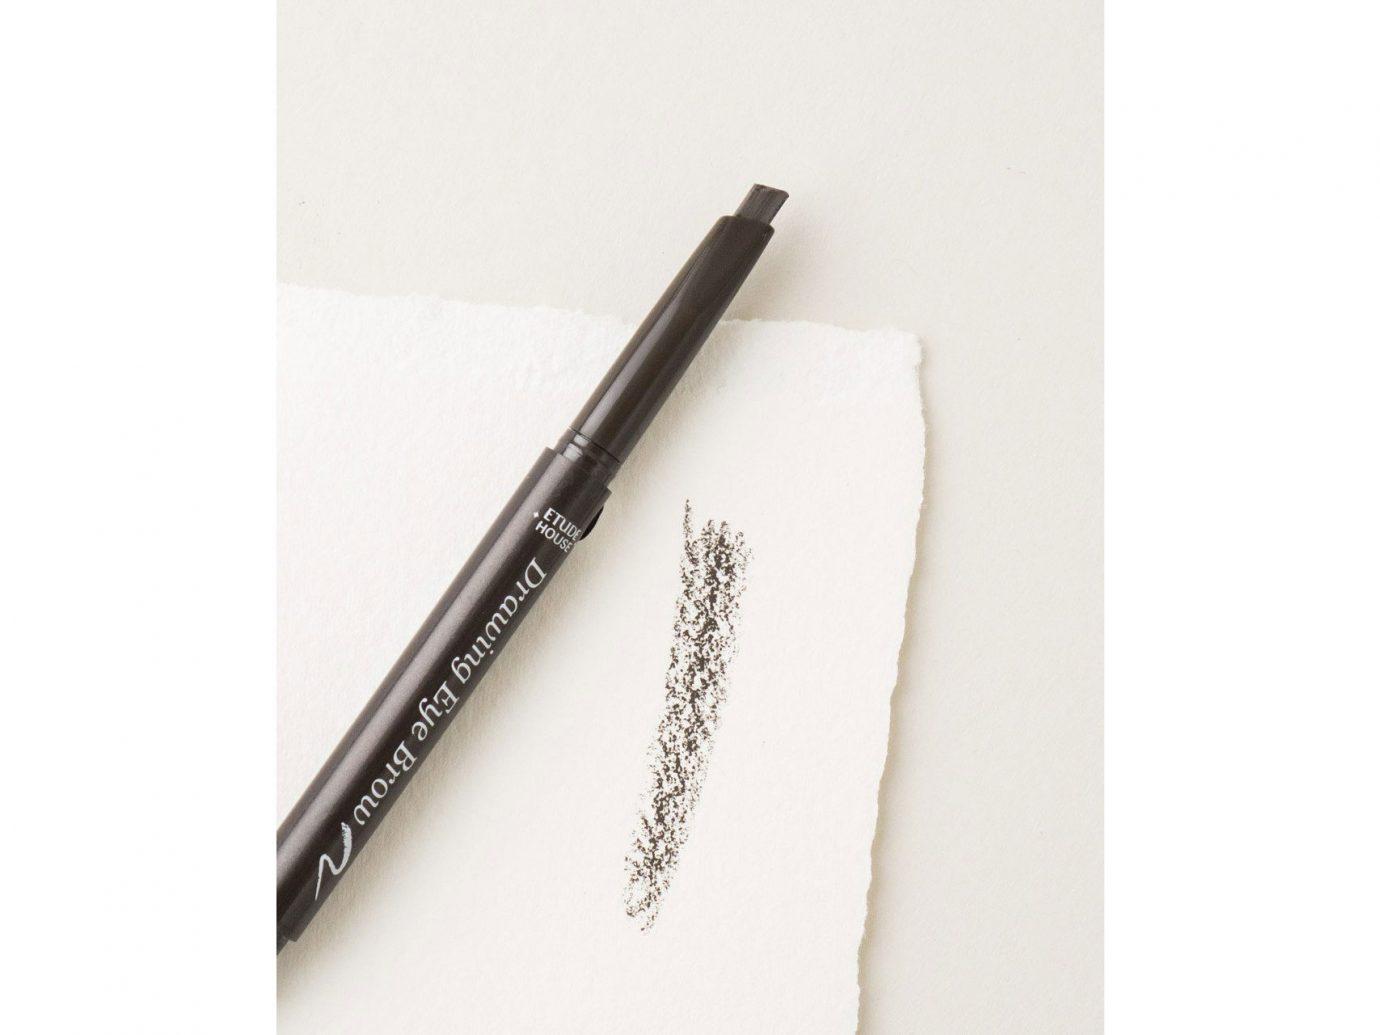 Etude House Drawing Eyebrow Pencil